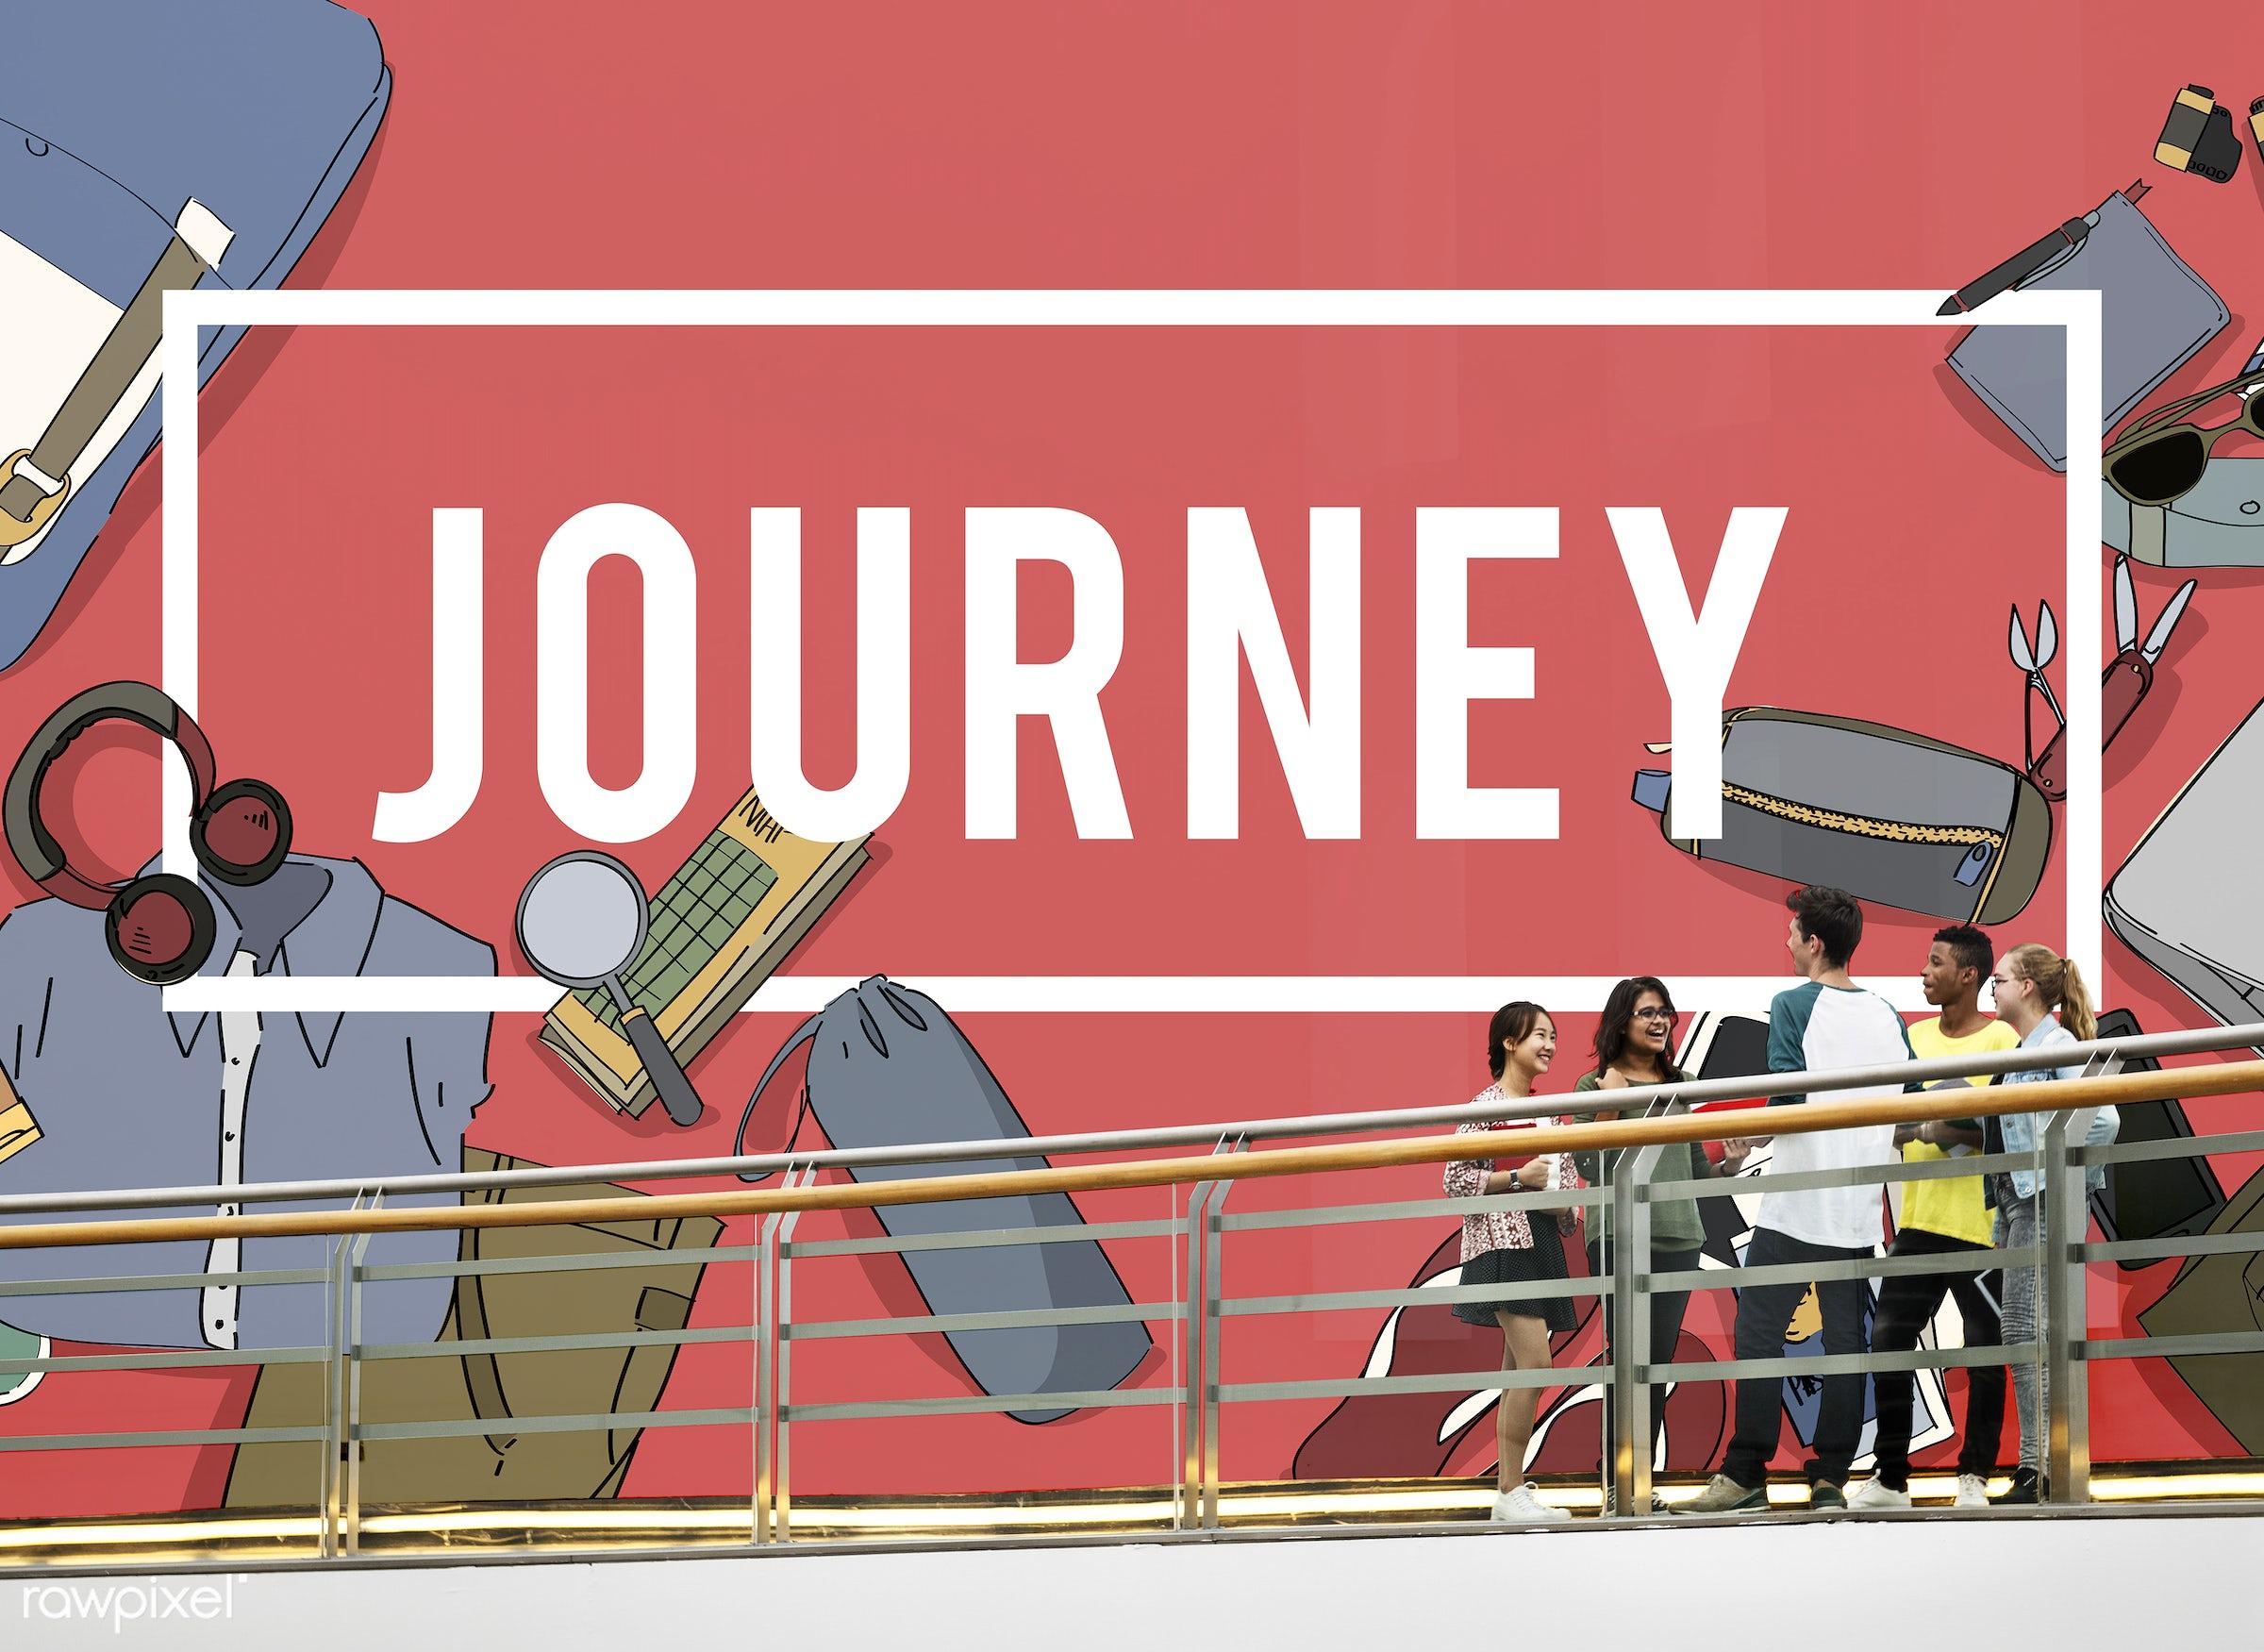 adventure, balance, book, books, boy, break, bridge, carrying, destination, directions, enjoyment, exploration, friends,...